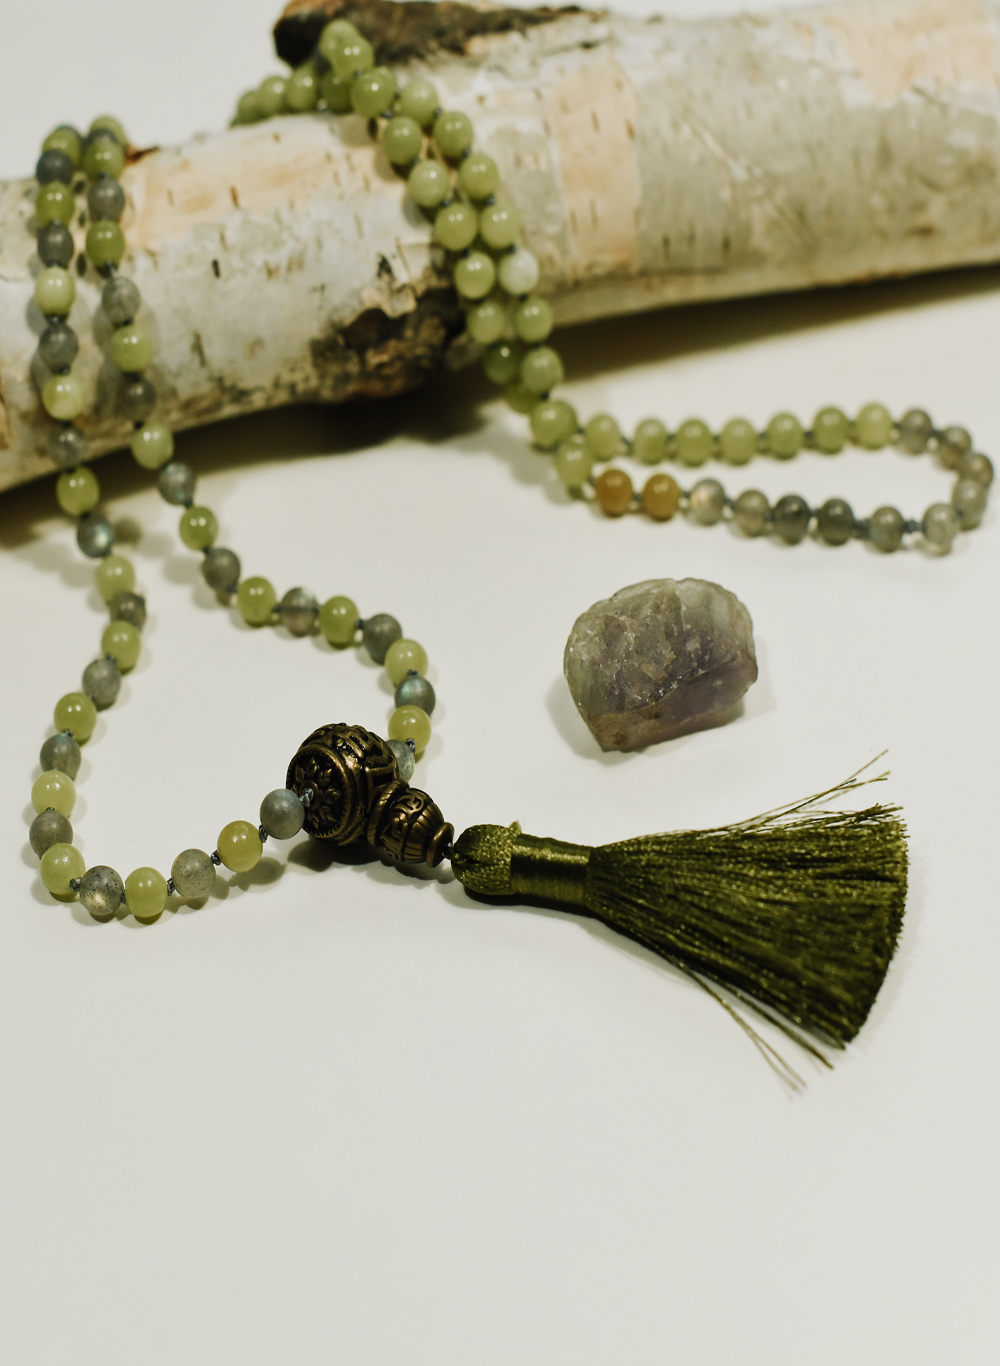 Mala Serpentine Jade + Labradorite – self healing – wisdom: All Chakra's – Muladhara, Swadhisthana, Manipura, Anahata, Vishuddha, Ajna and Sahasrara (root, naval,solar plexus, heart, throat, third eye and crown) handcrafted by Fia